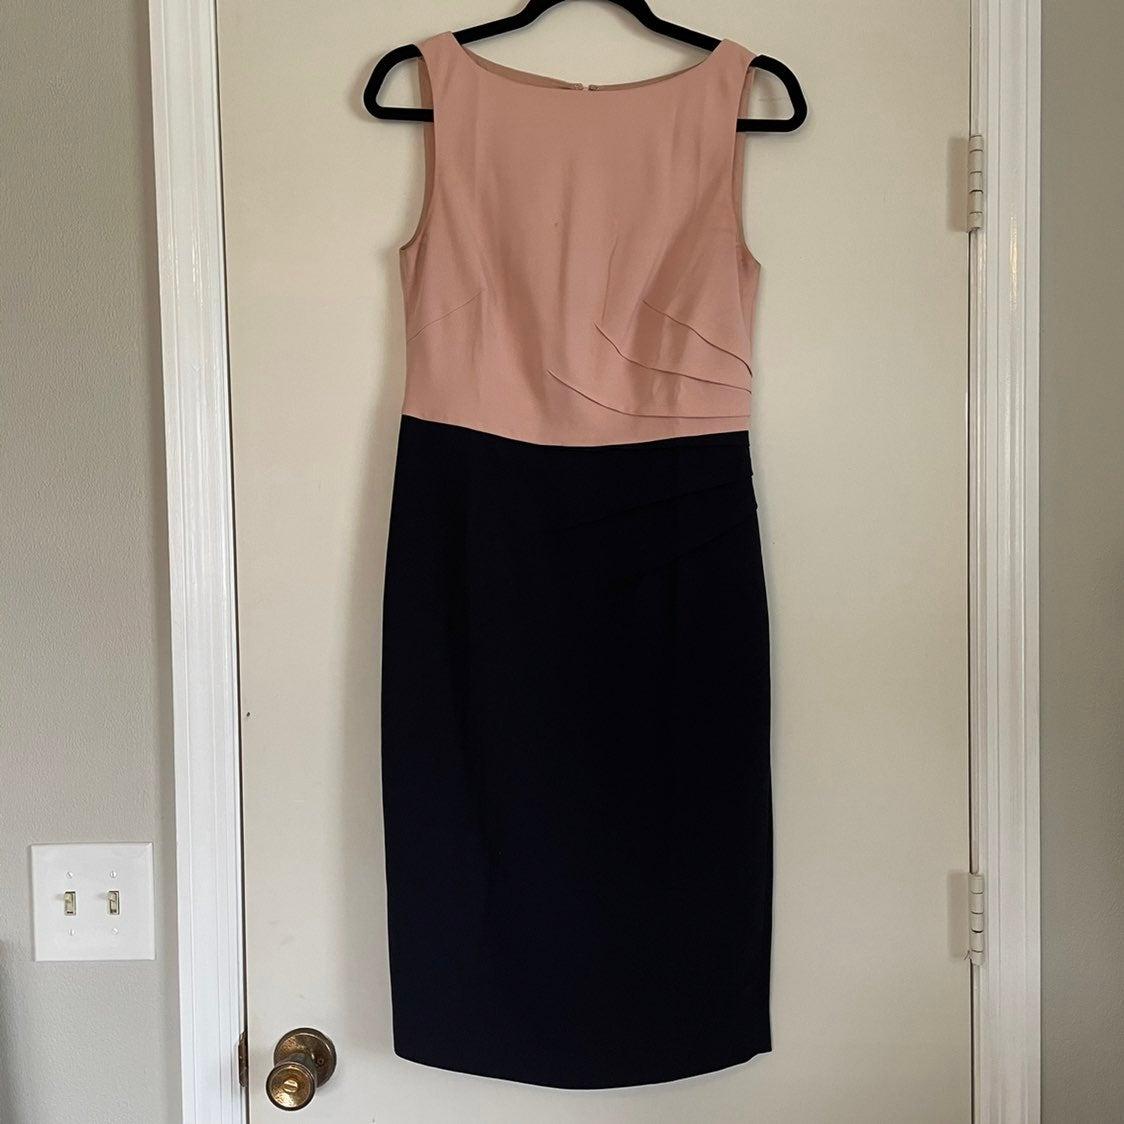 Hobbs Invitation dress 6 pink black